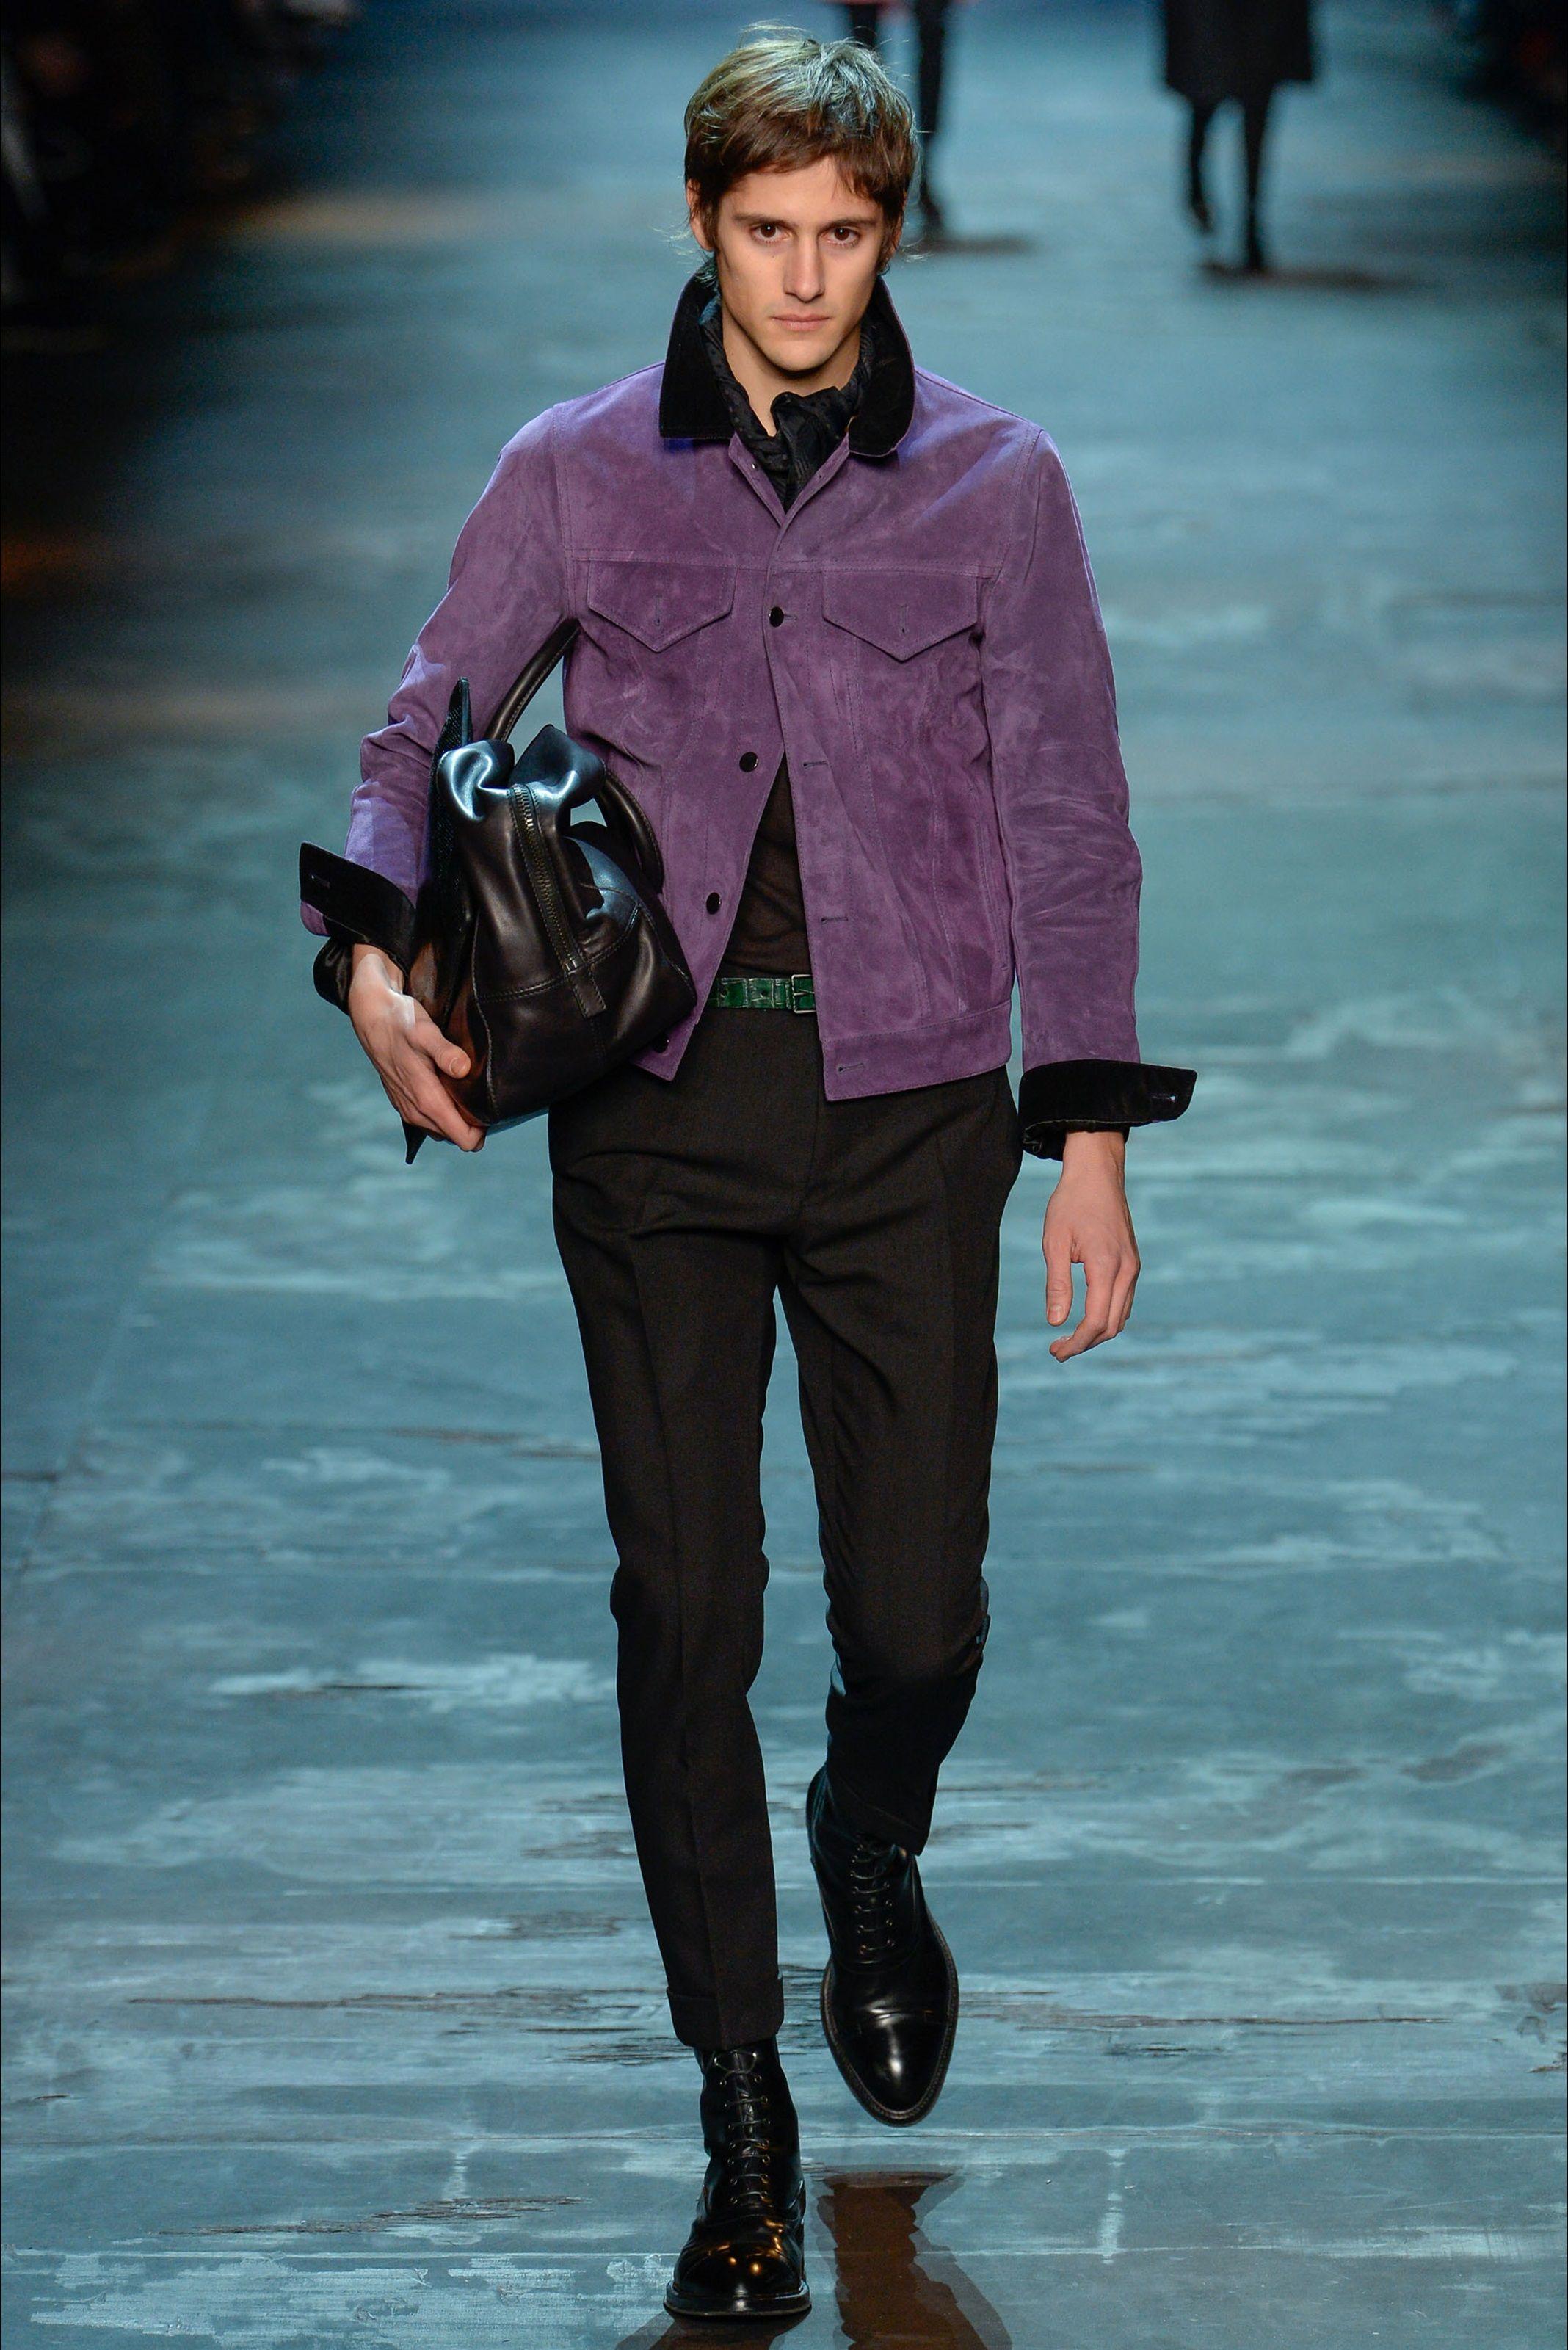 Sfilata Moda Uomo Berluti Parigi - Autunno Inverno 2017-18 - Vogue ... 64281256e37